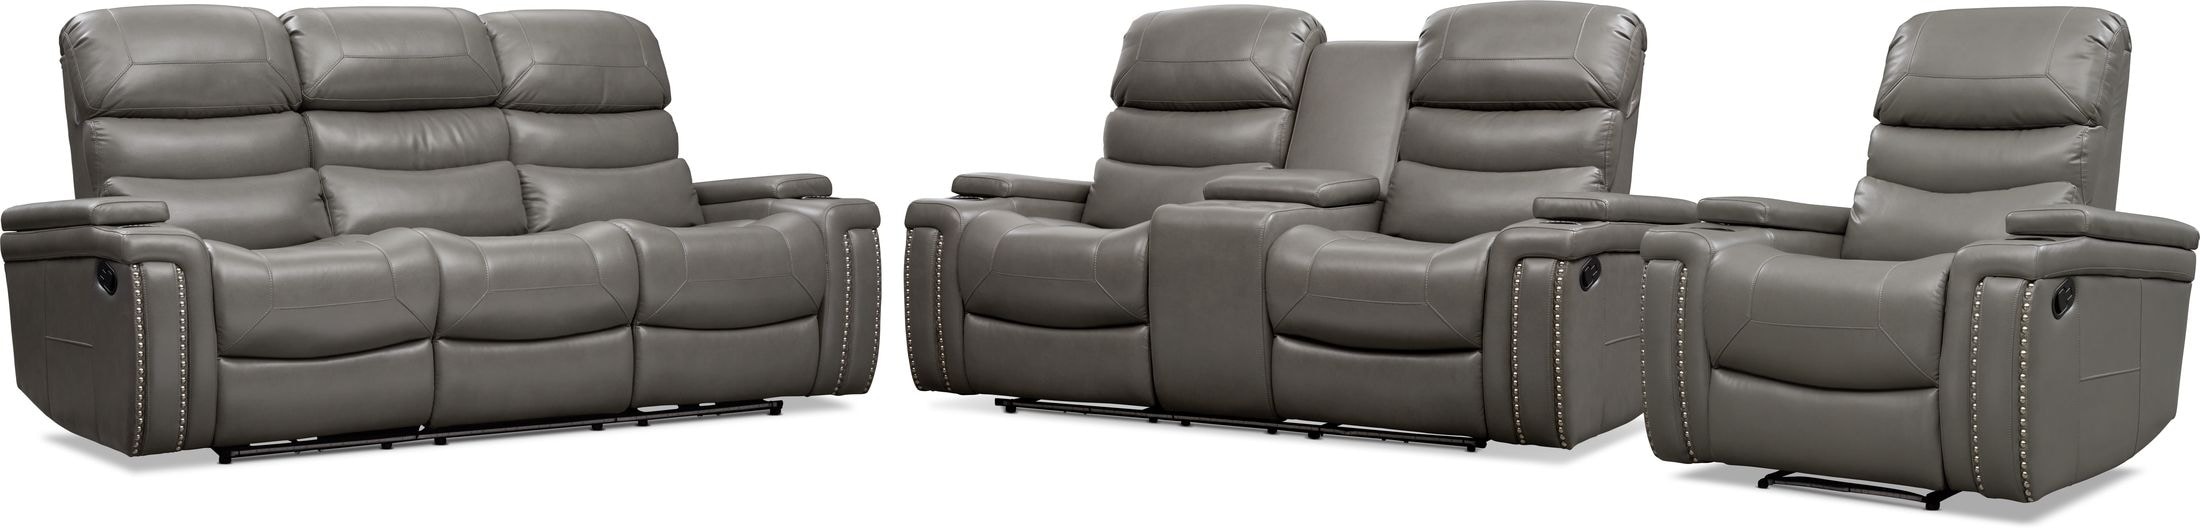 Living Room Furniture - Jackson Manual Reclining Sofa, Loveseat, and Recliner